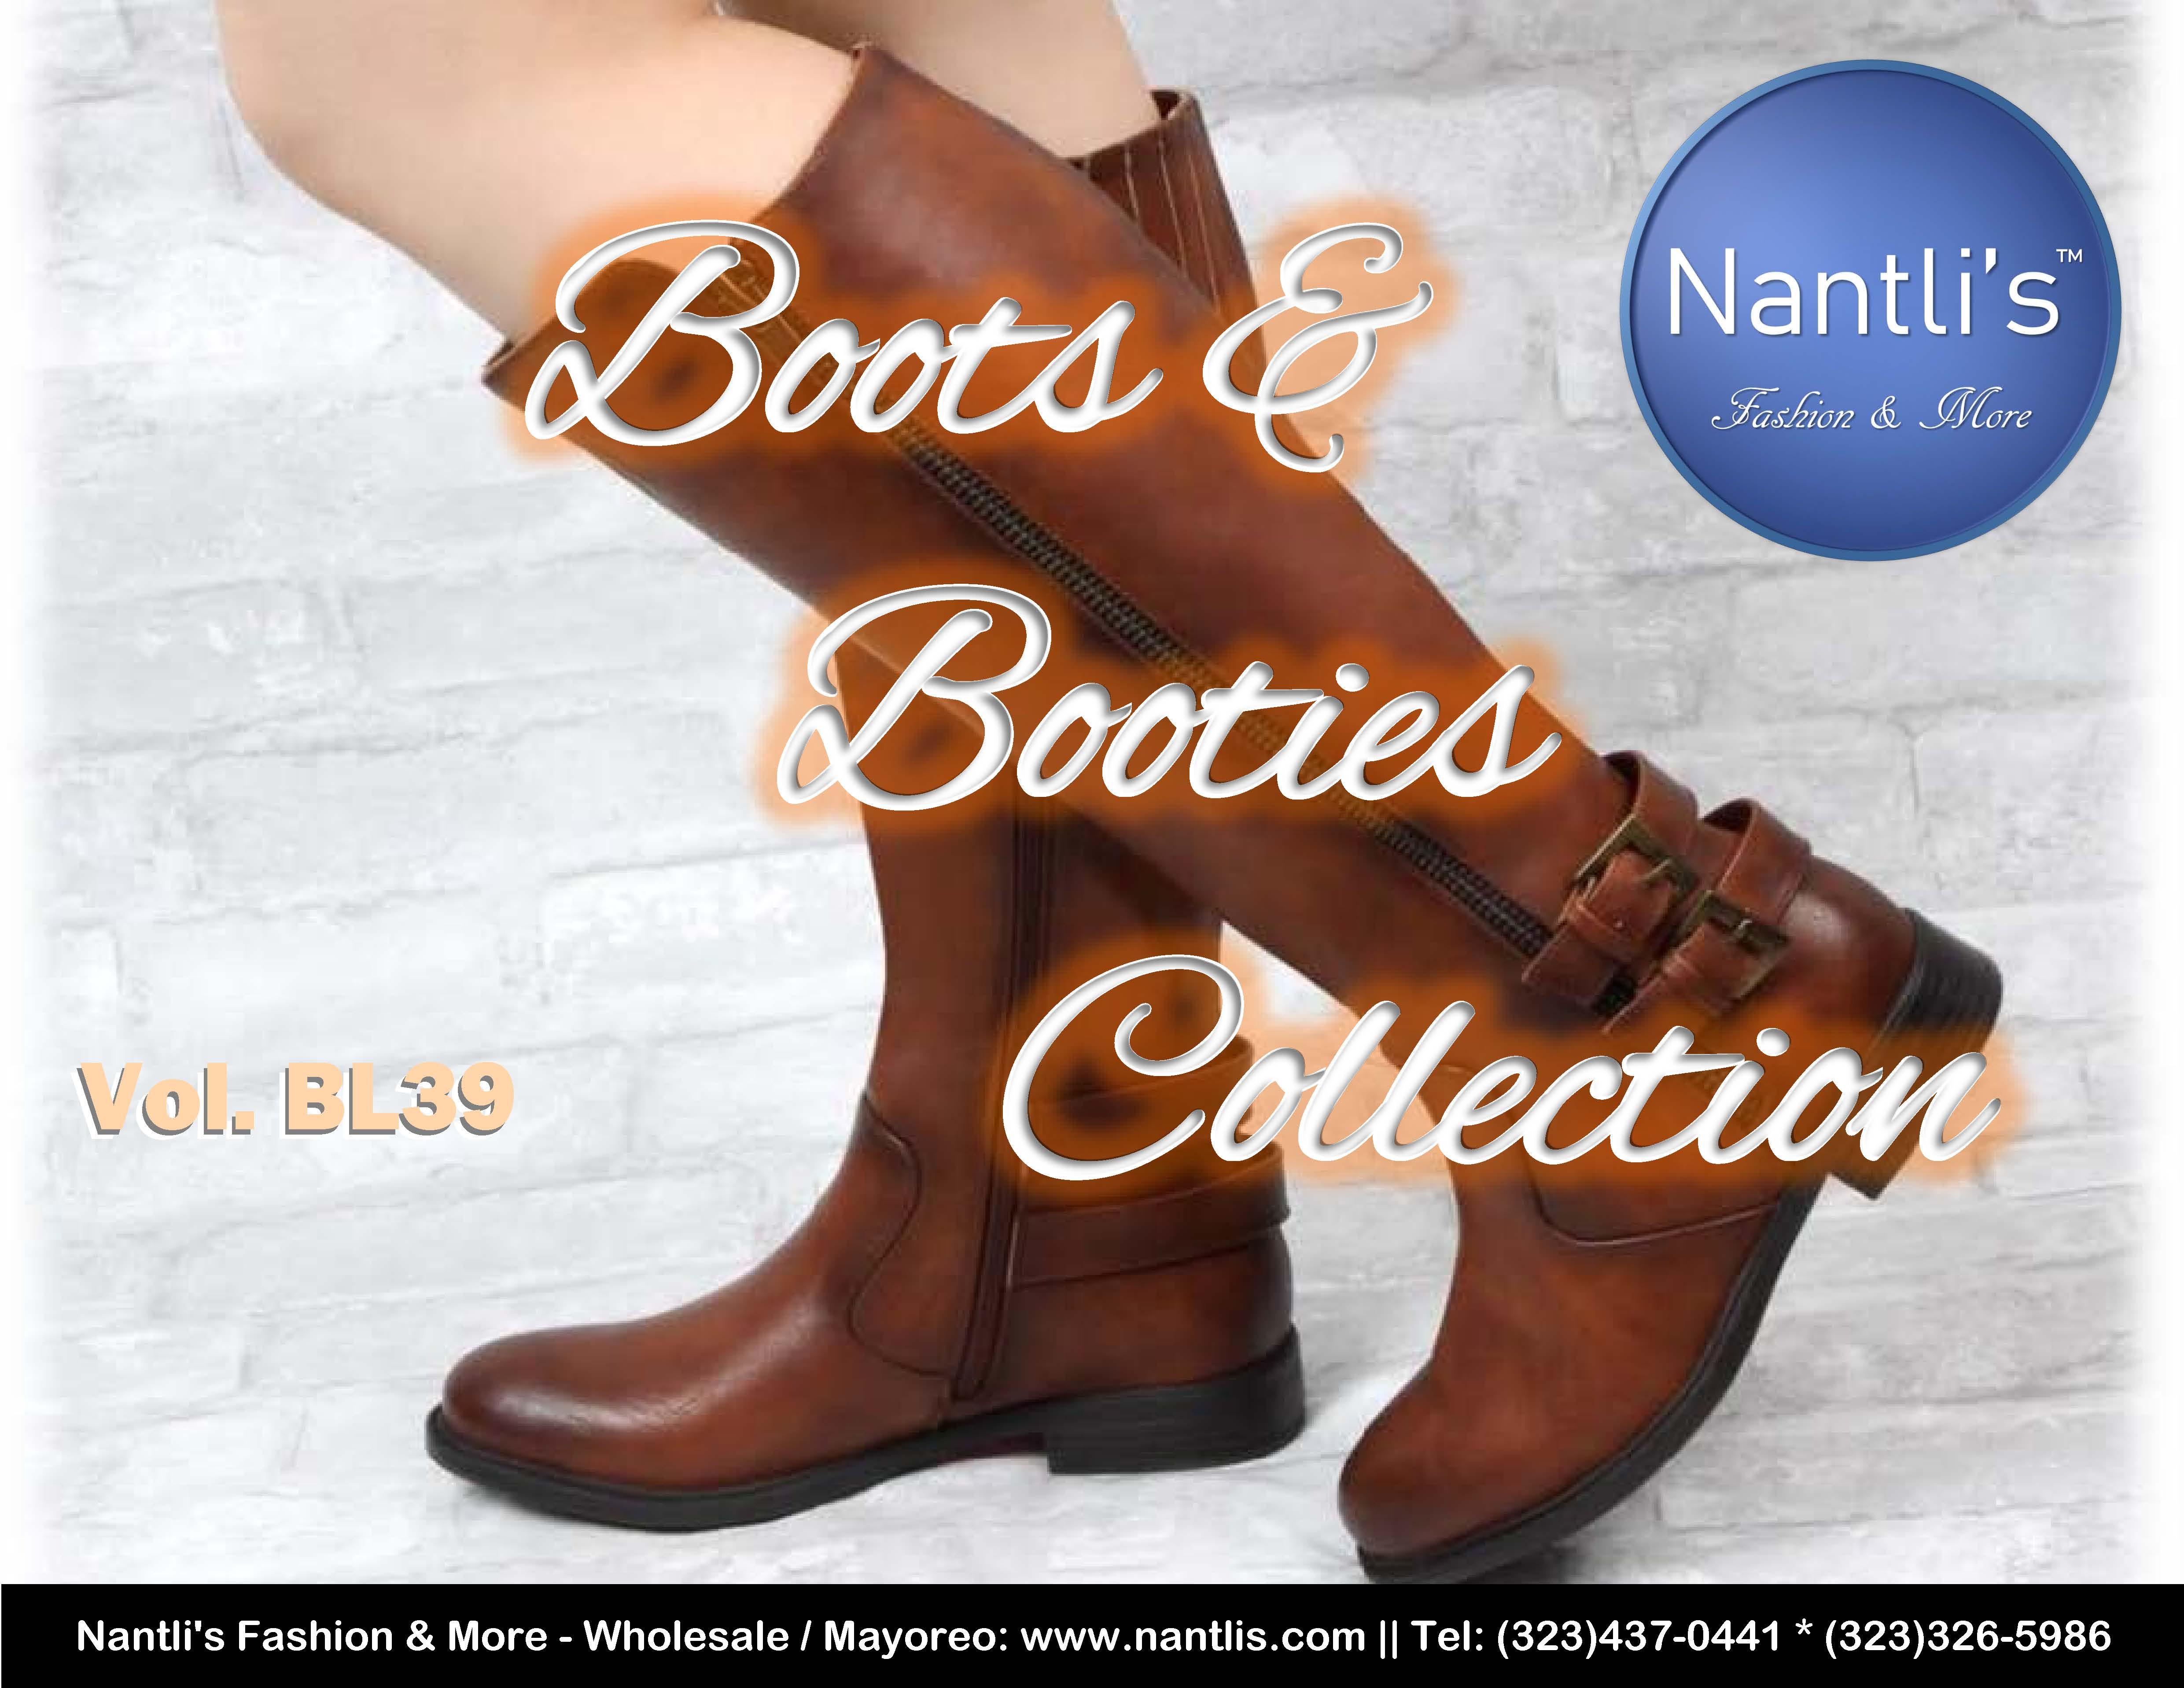 Nantlis Vol BL39 Botas de Mujer mayoreo Catalogo Wholesale womens Boots_Page_01